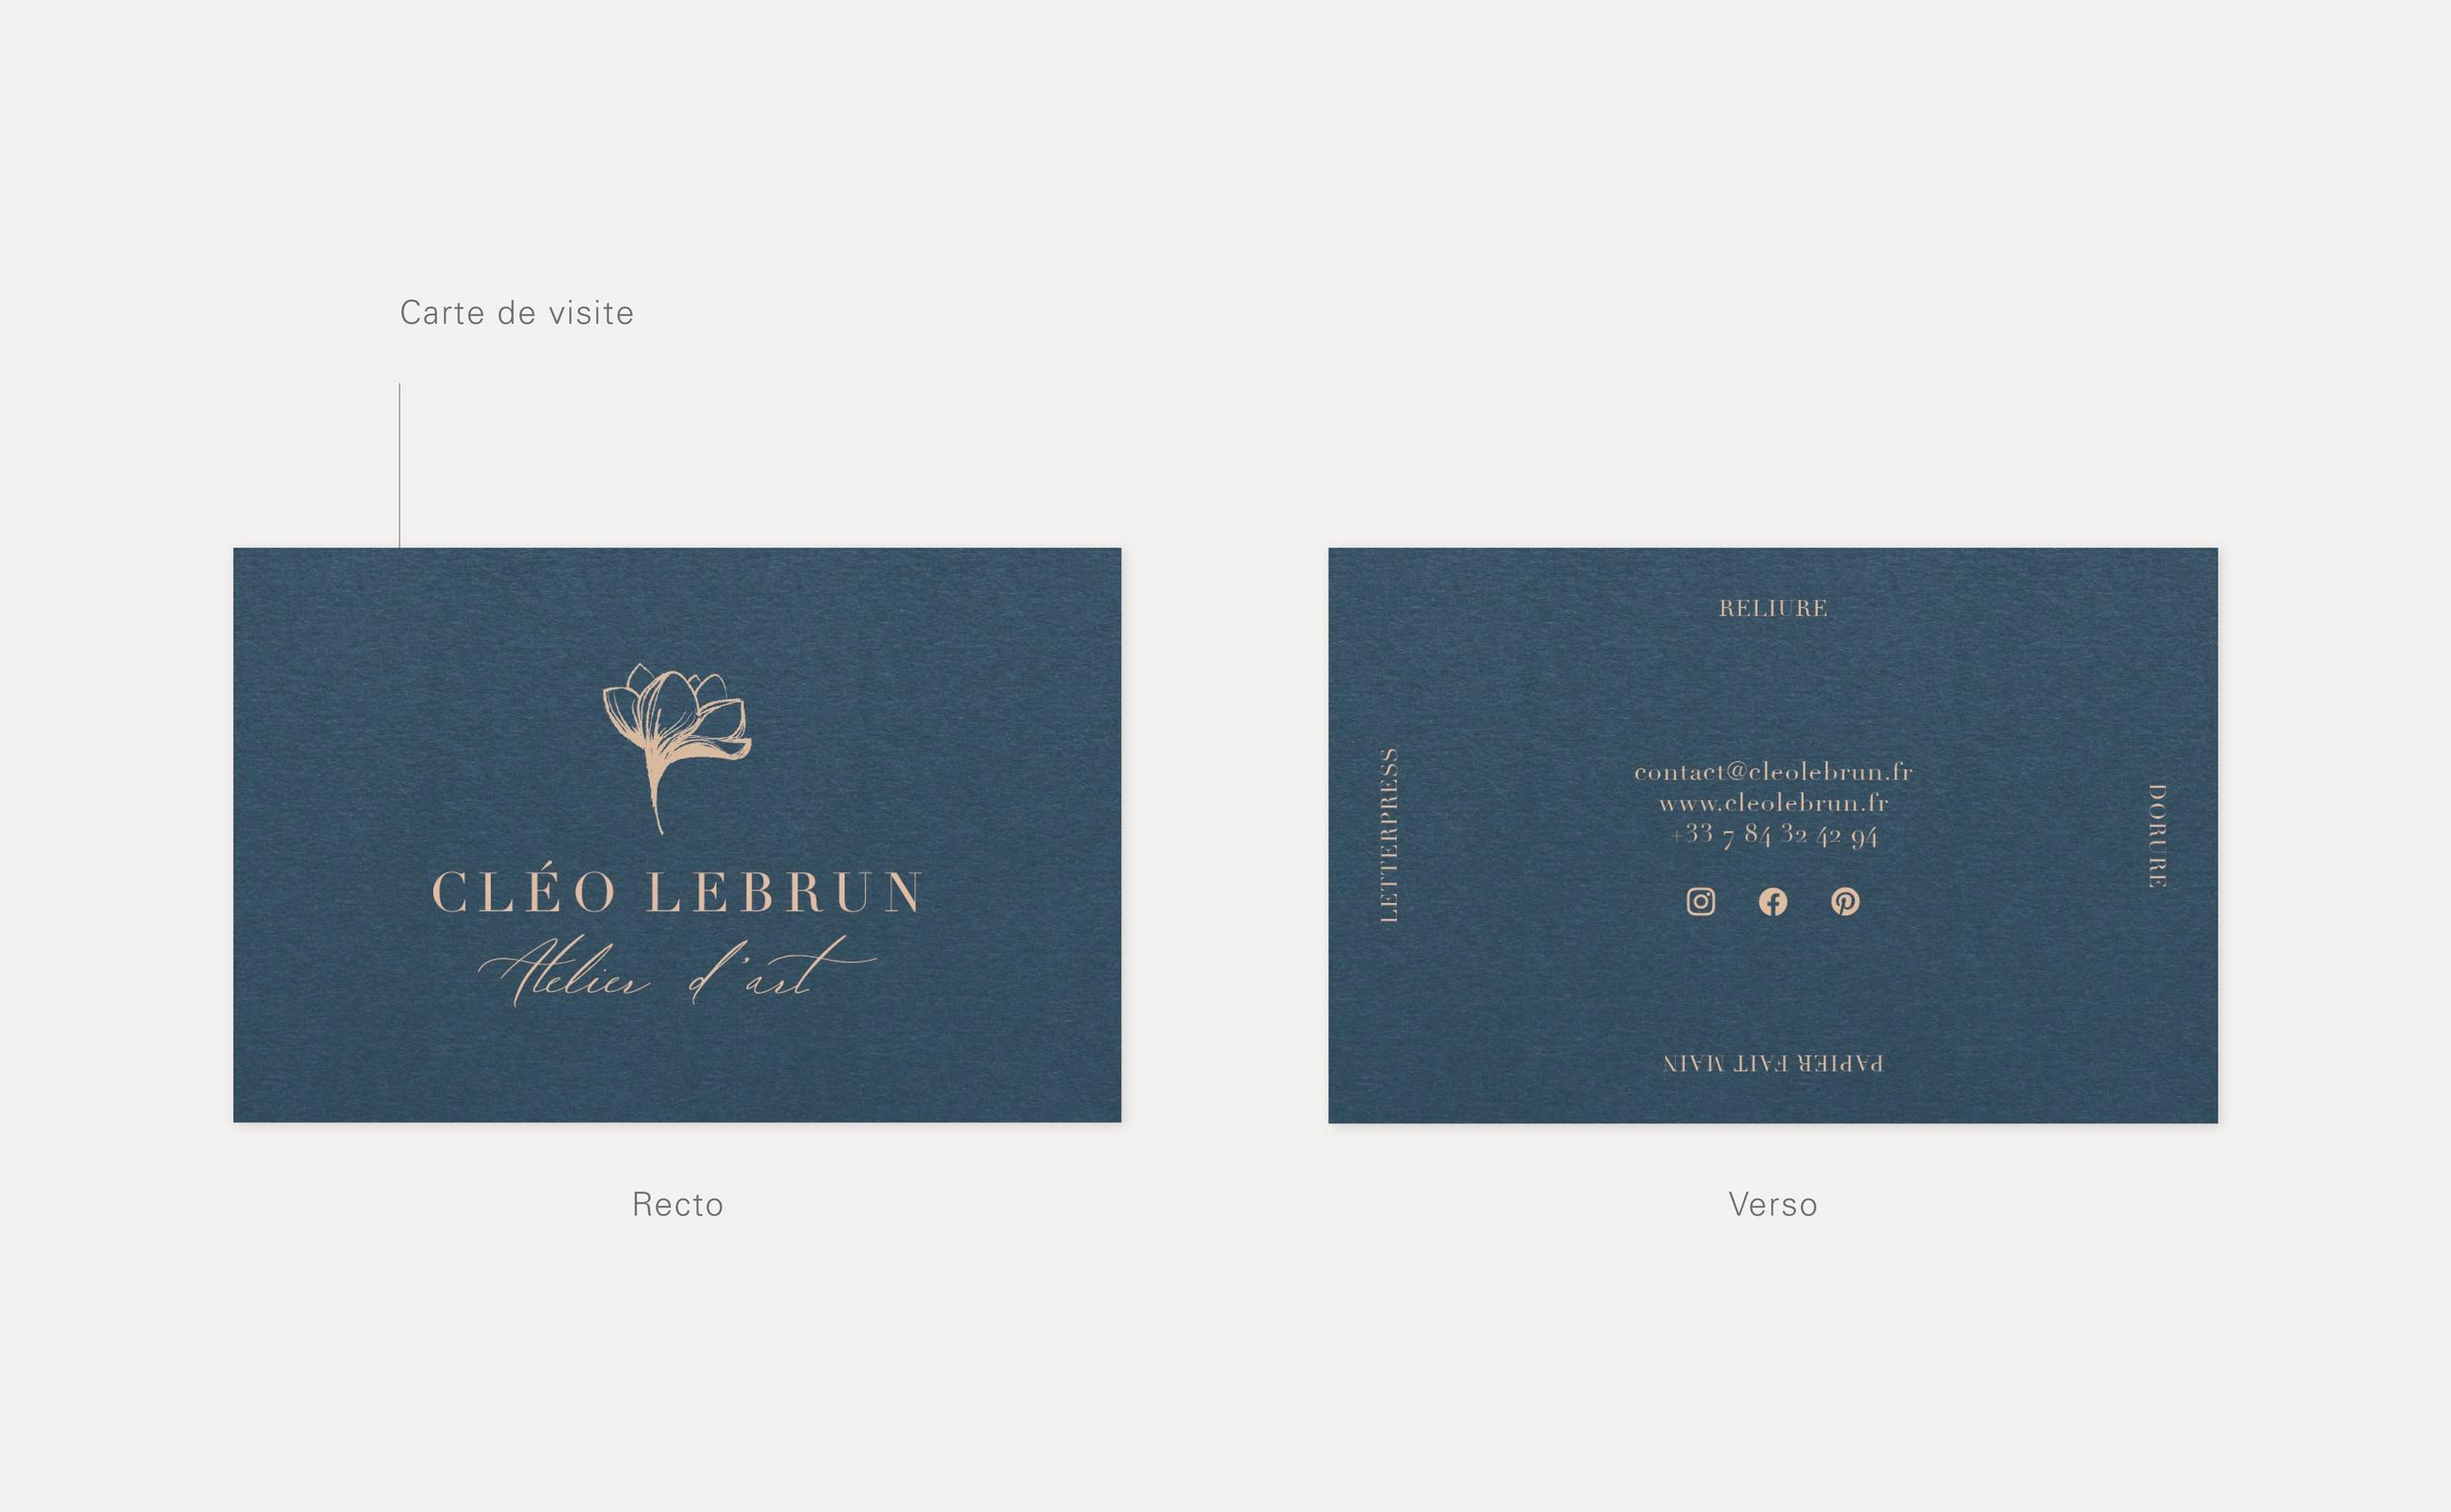 Atelier d'art Cléo Lebrun 11